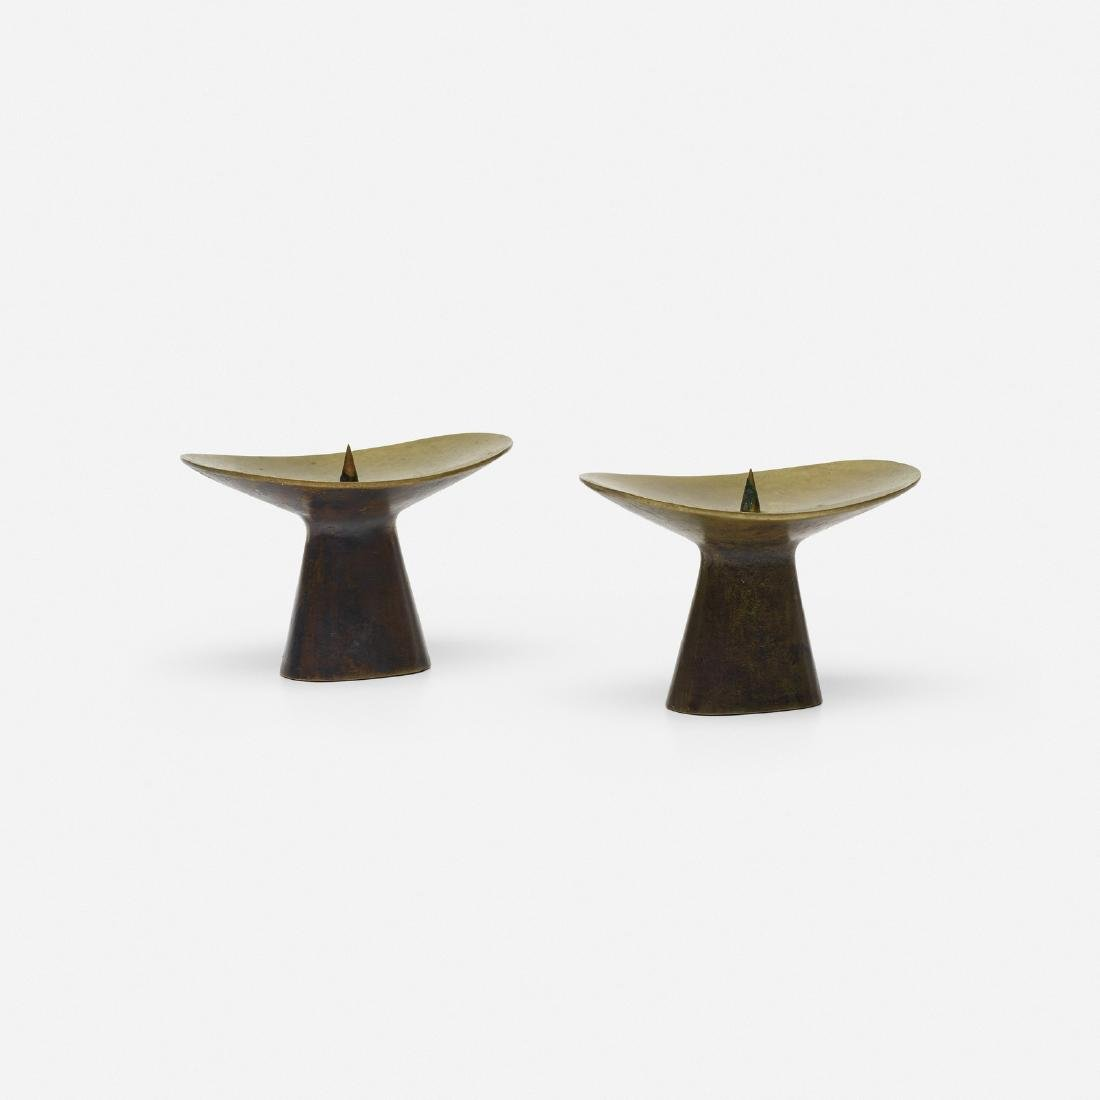 Carl Aubock II, candlesticks, pair